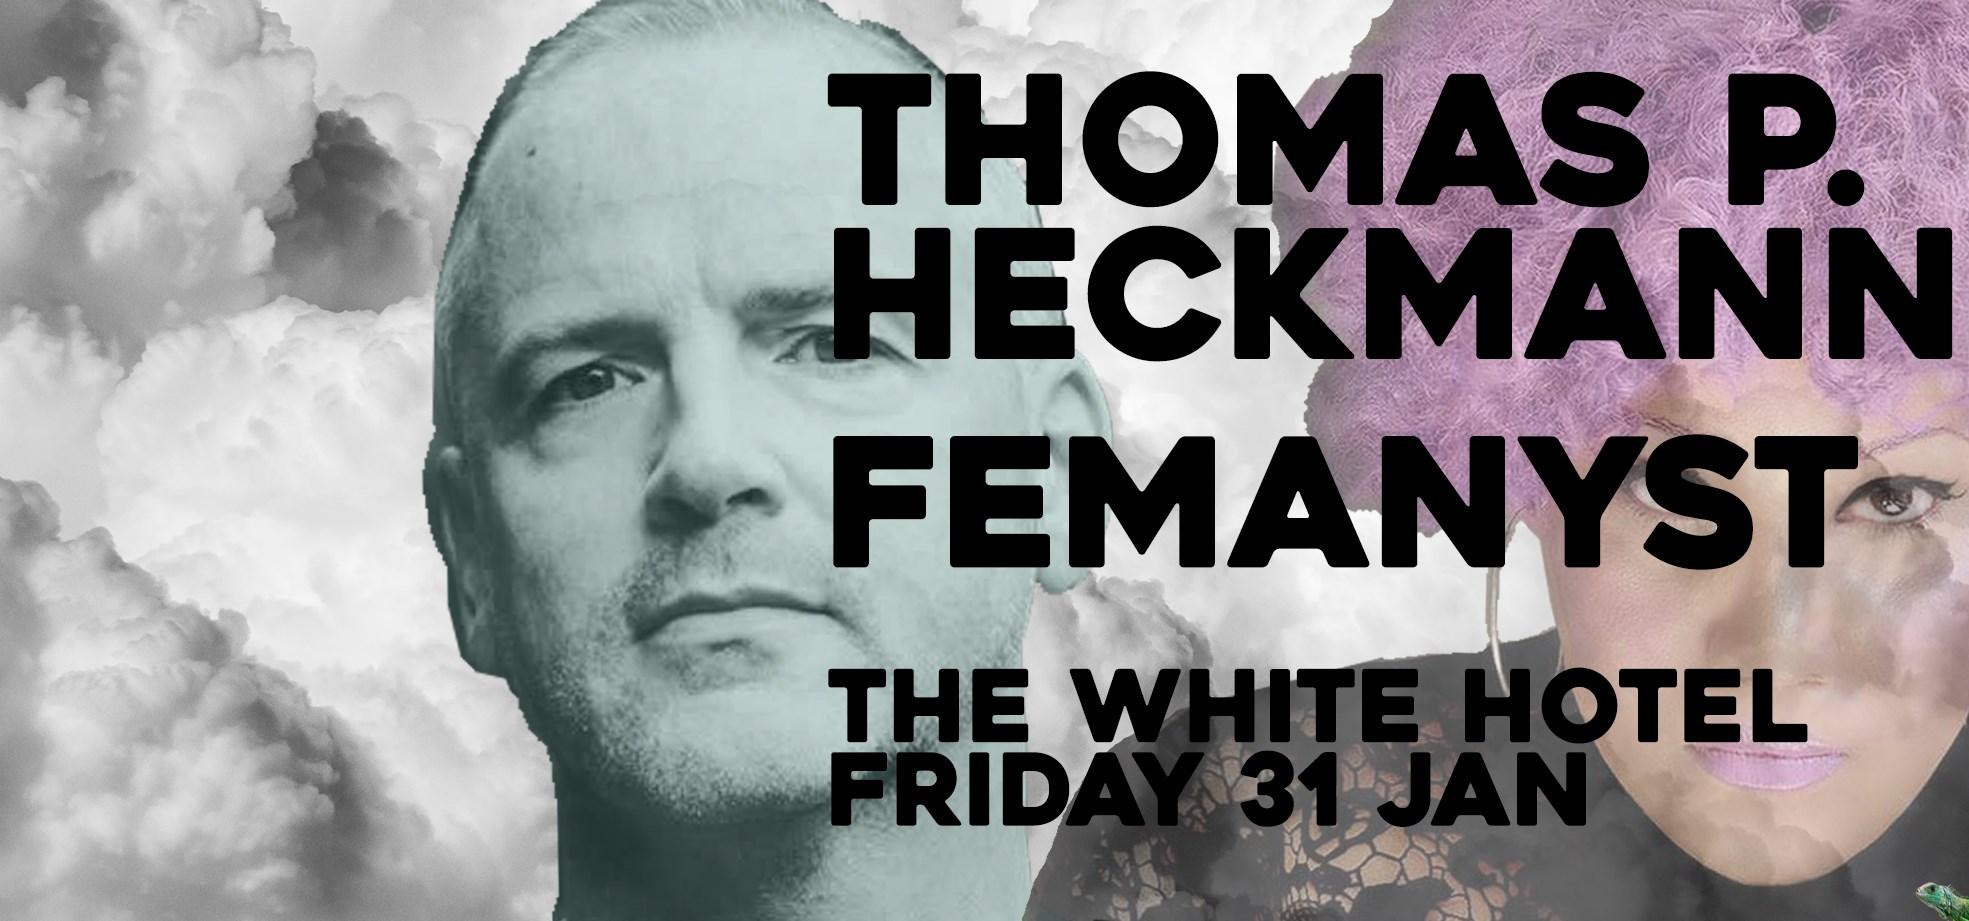 31.01.20: Thomas P. Heckmann & Femanyst